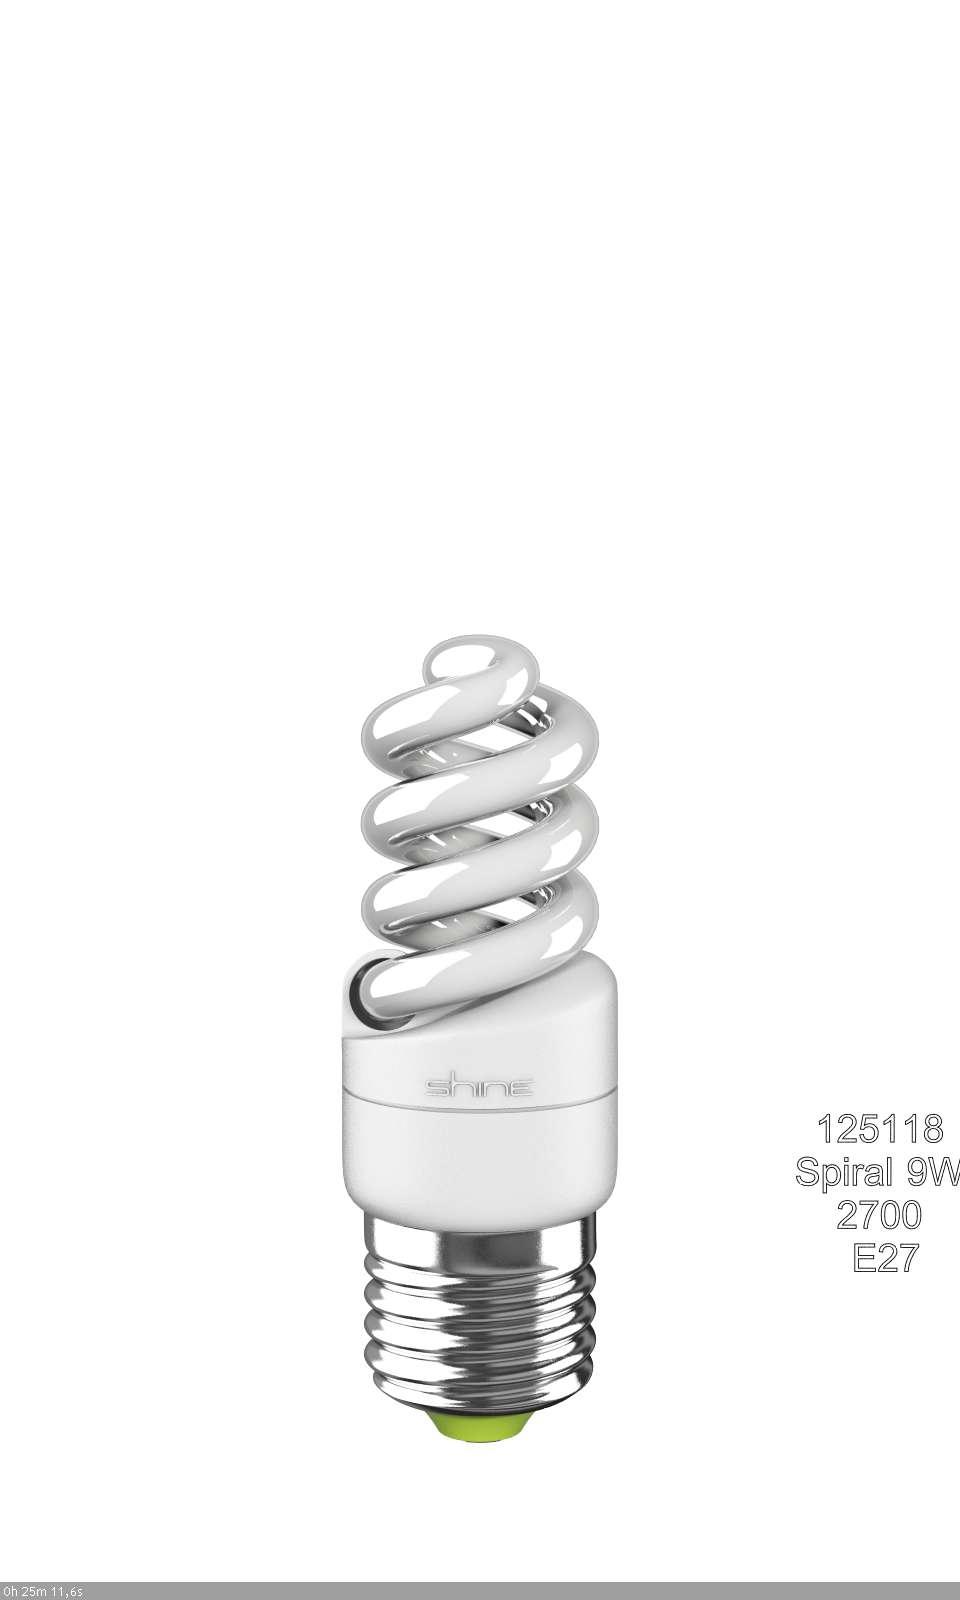 ььЛампа энергосберегающая E27,  9W, Spiral, 2700K (теплый свет), Shine